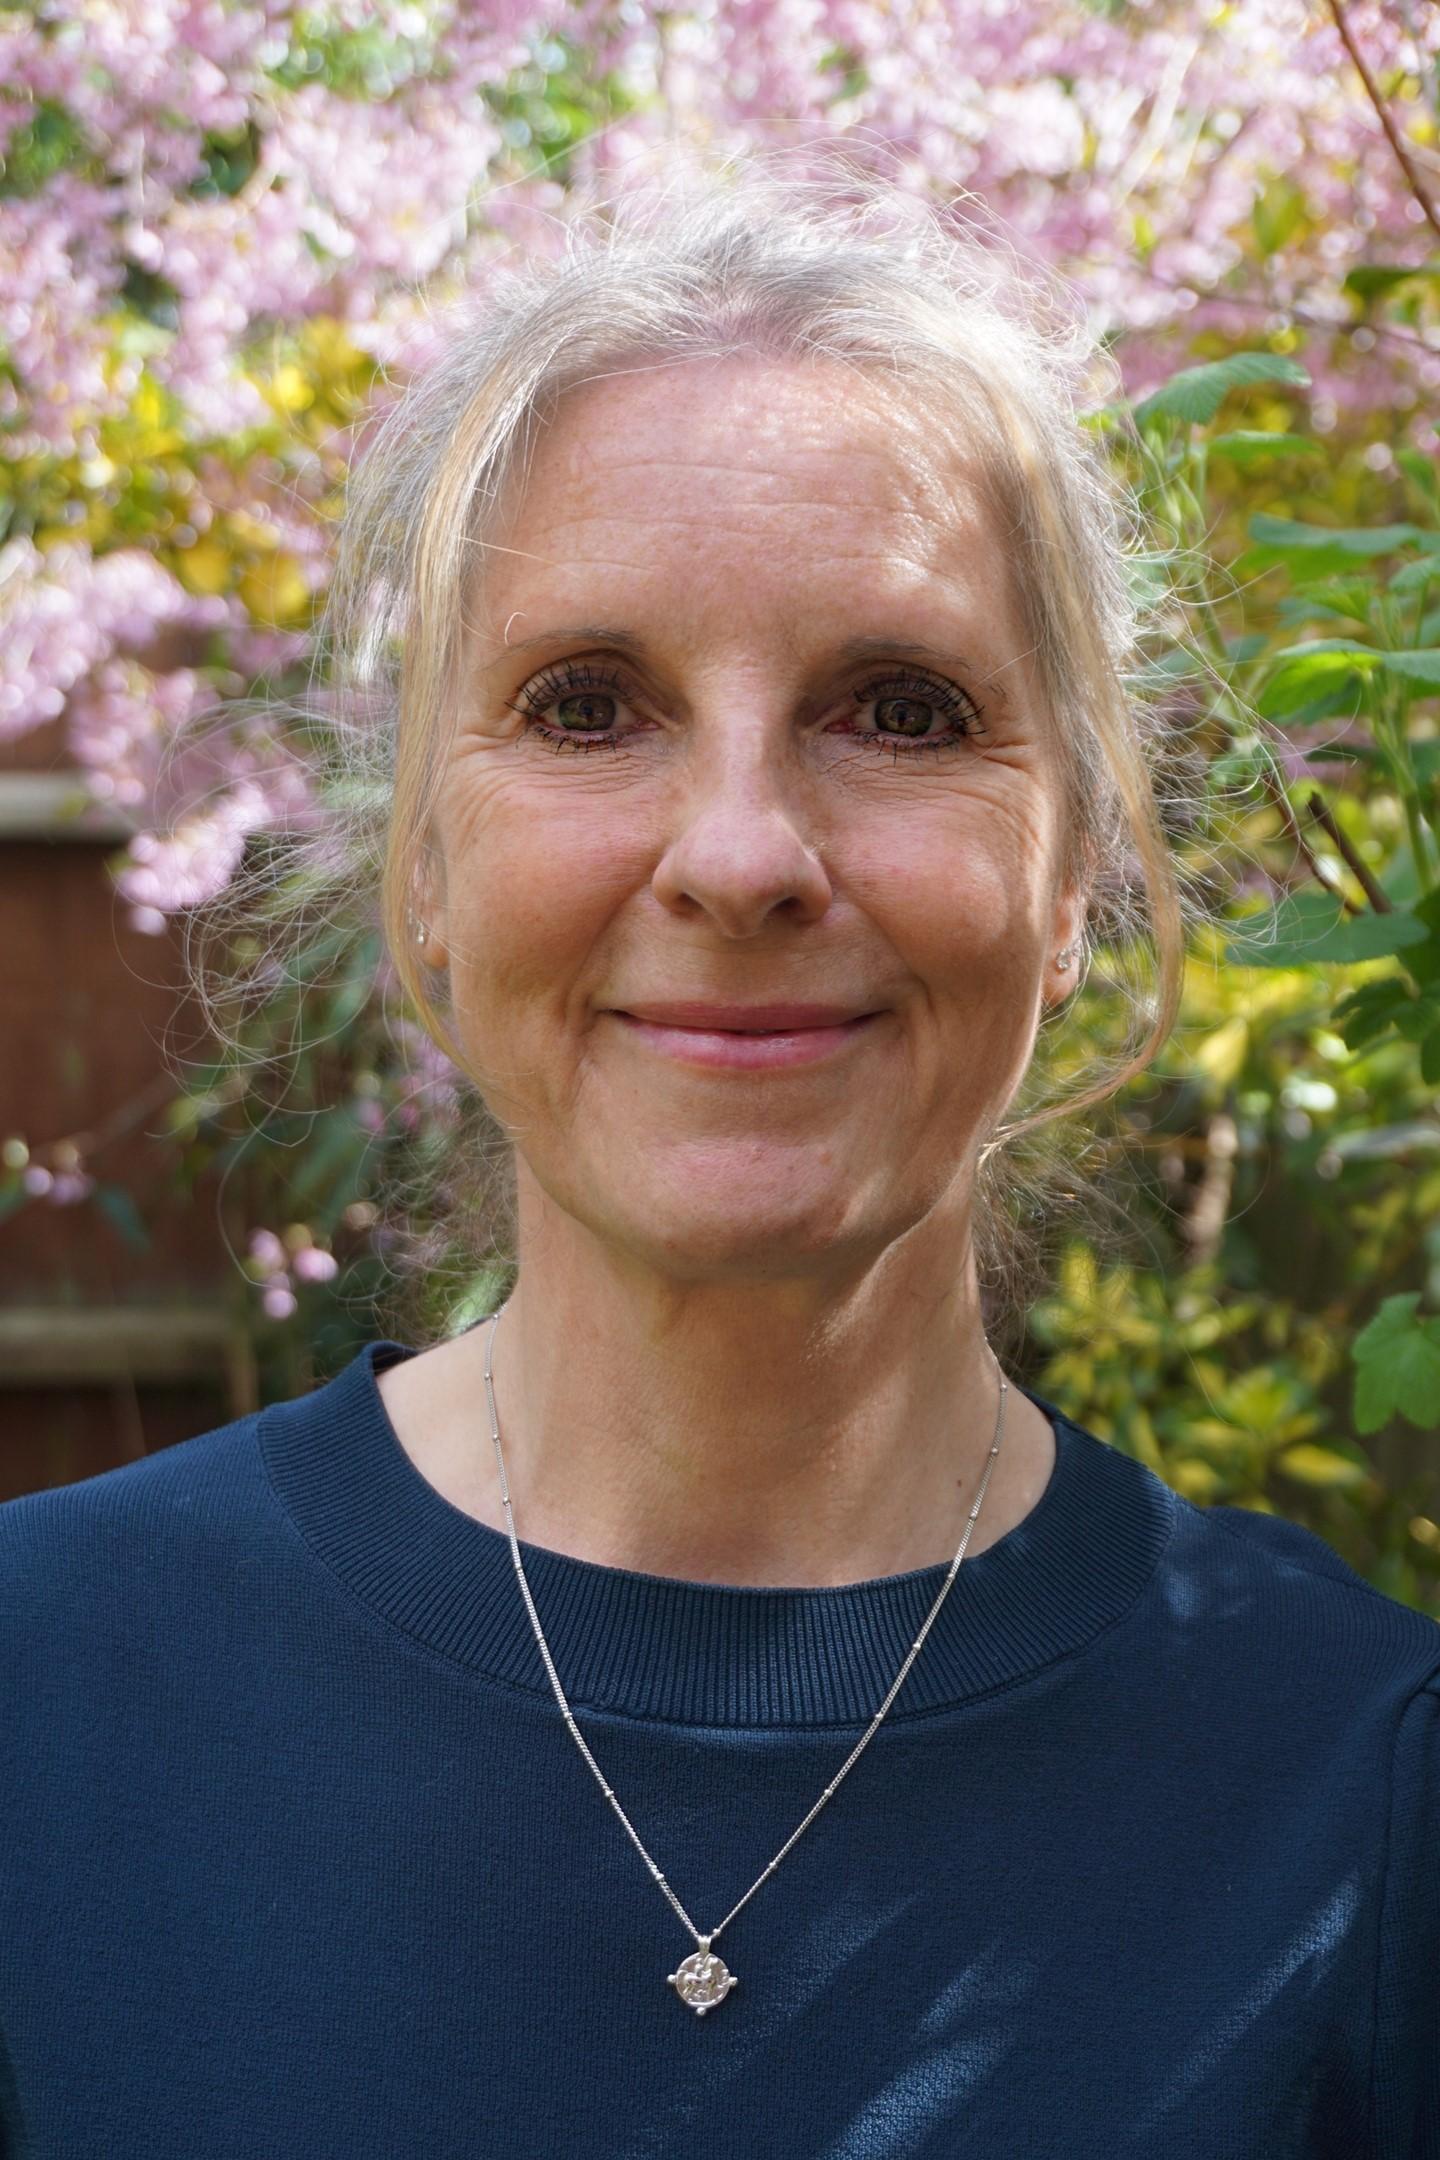 Claire Redding